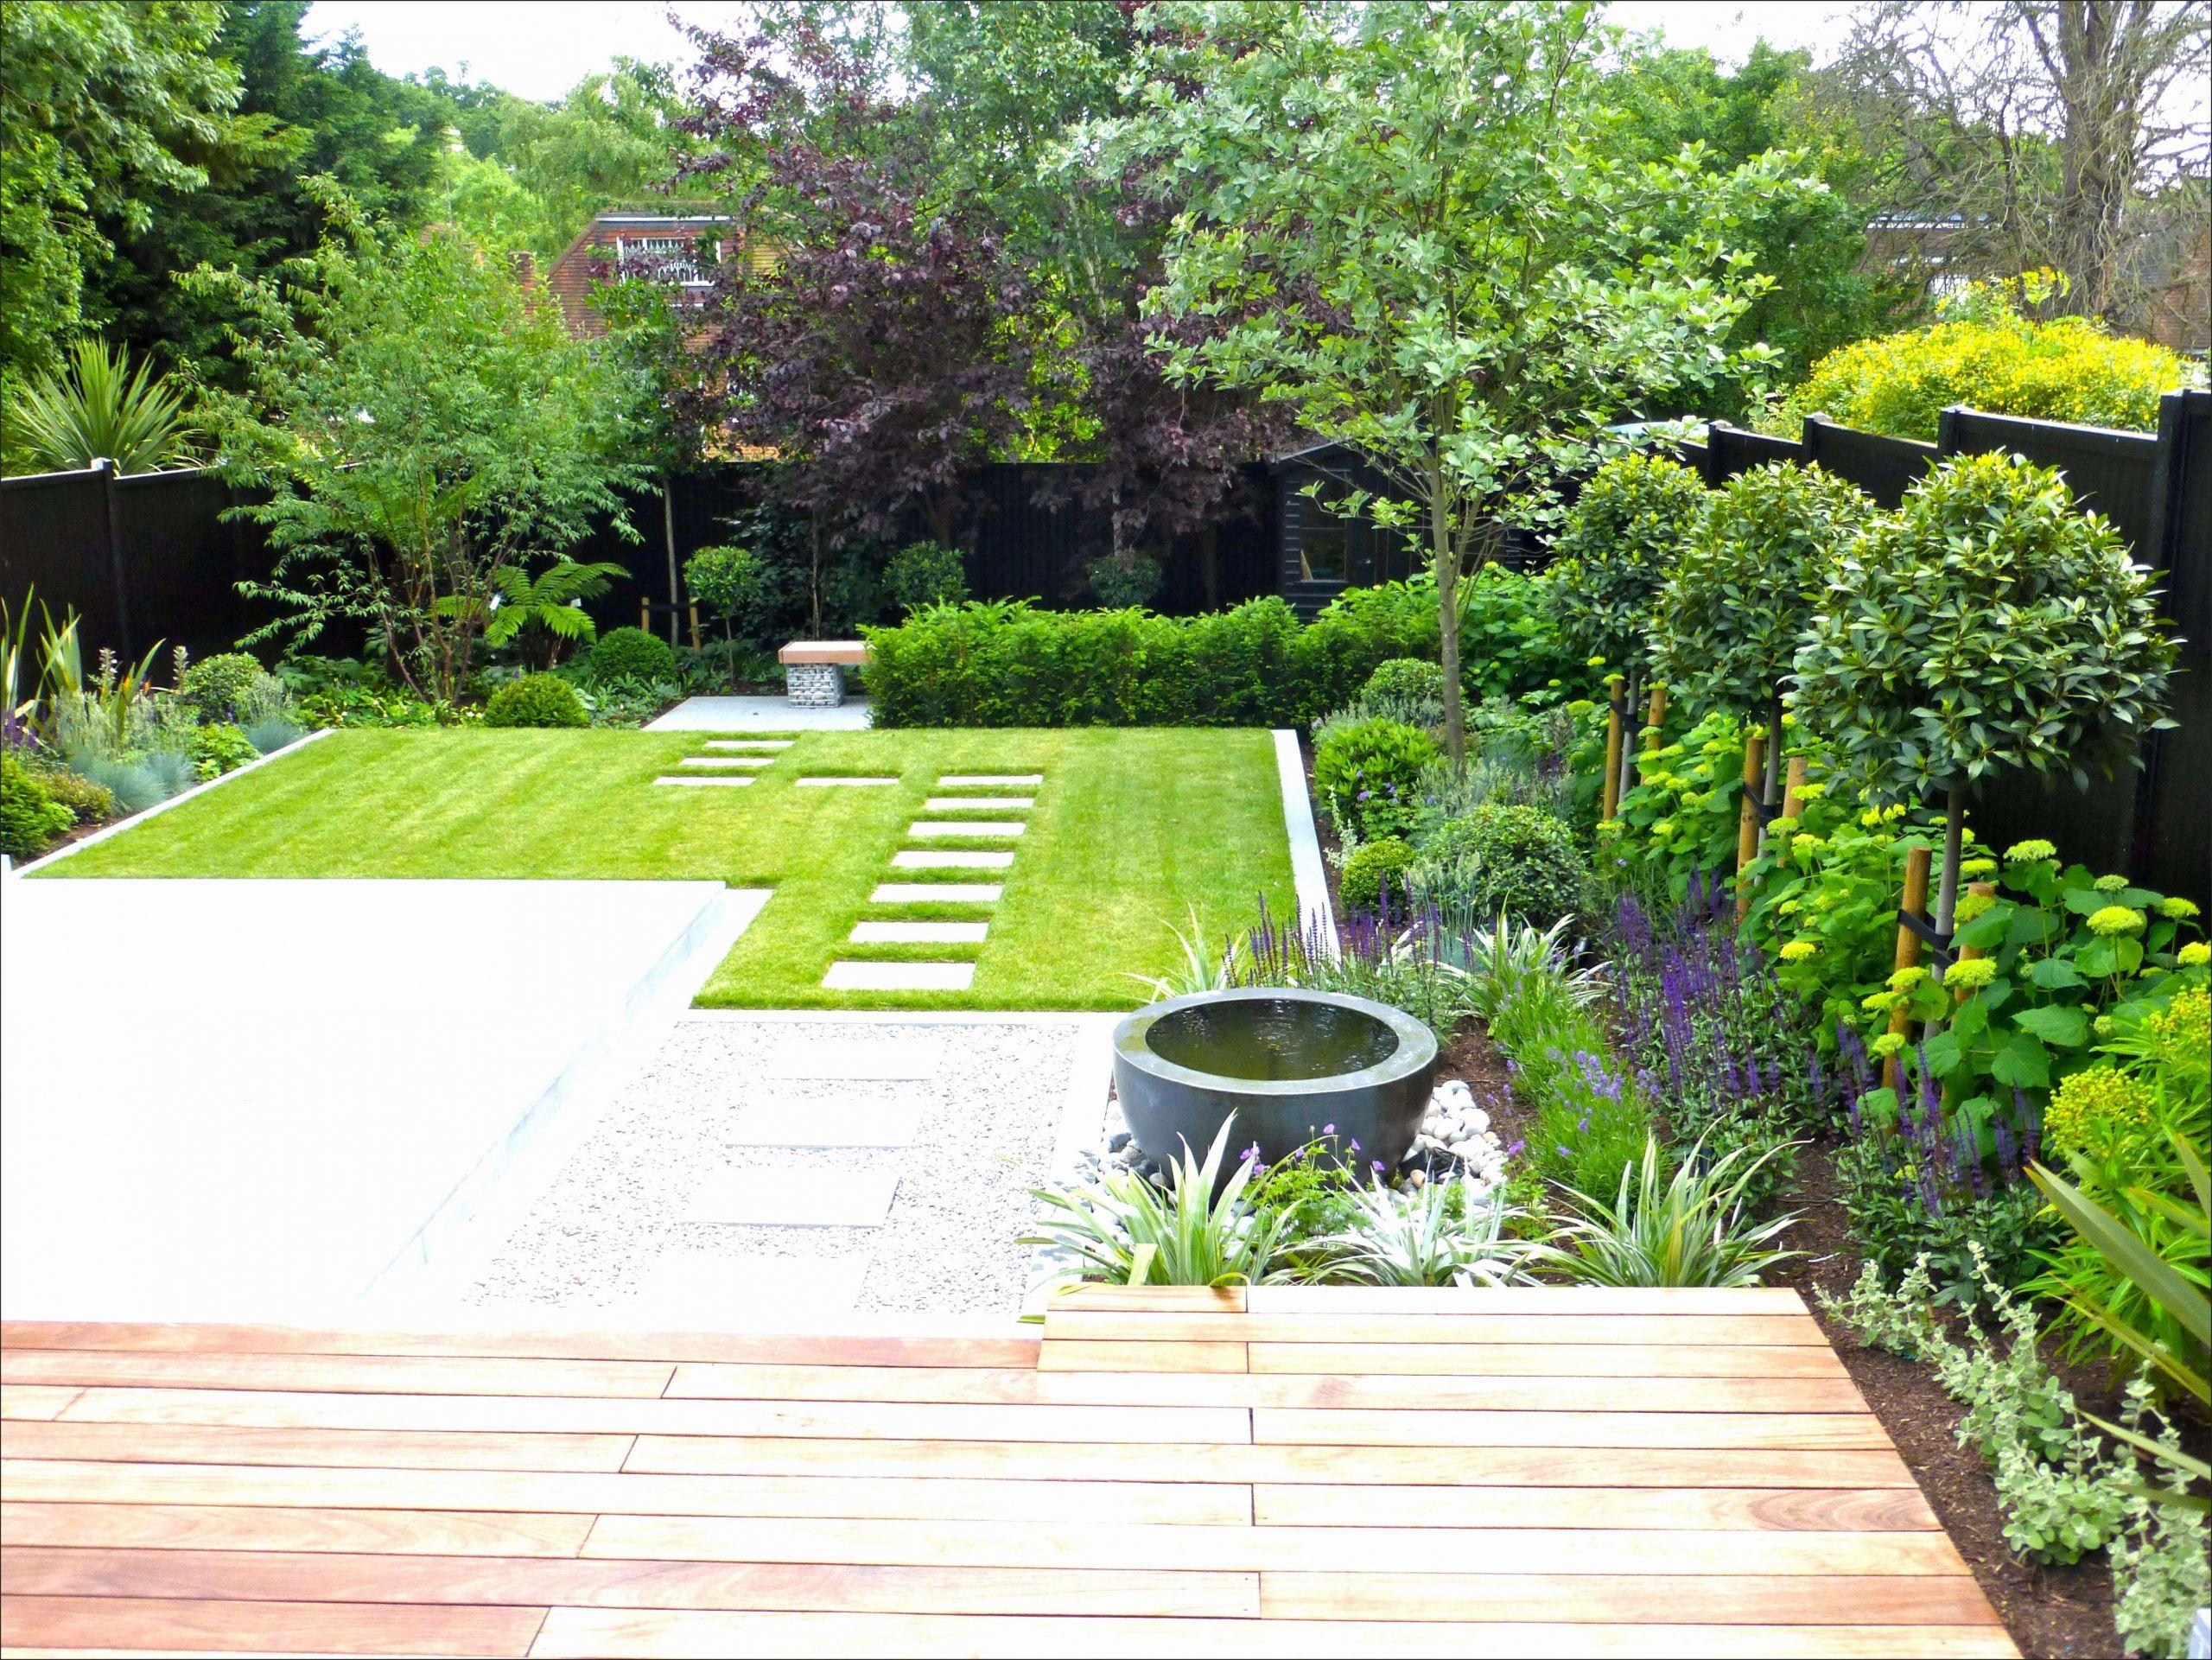 36 Luxus Gartenideen Fur Kleine Garten Garten Deko